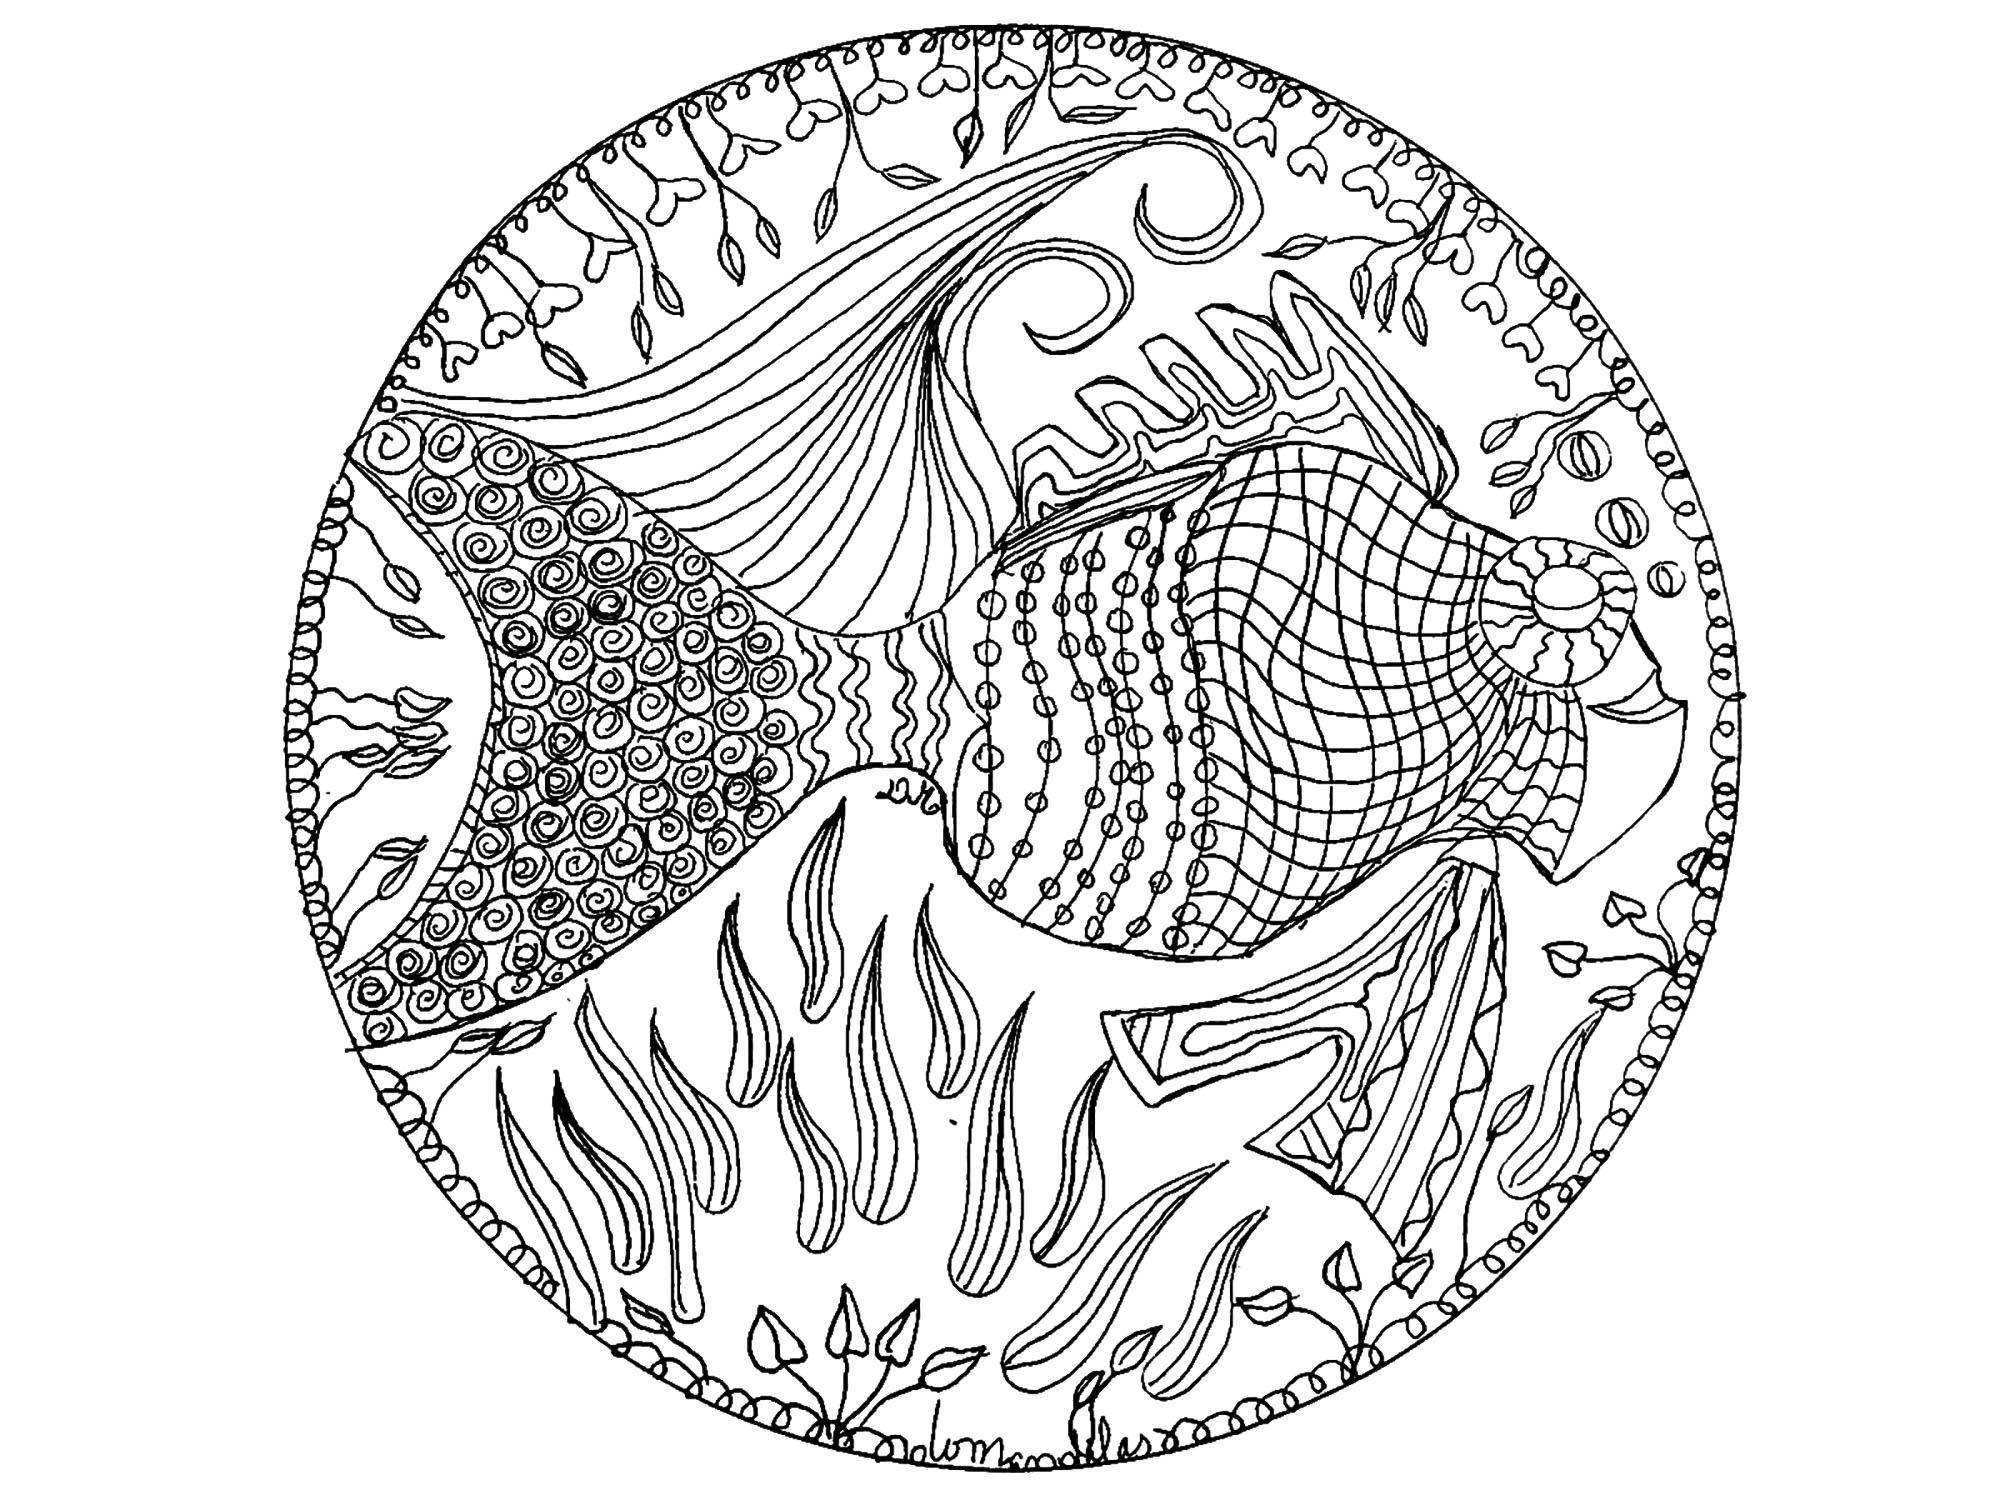 Mandala Fish Mandalas Coloring Pages For Adults Justcolor